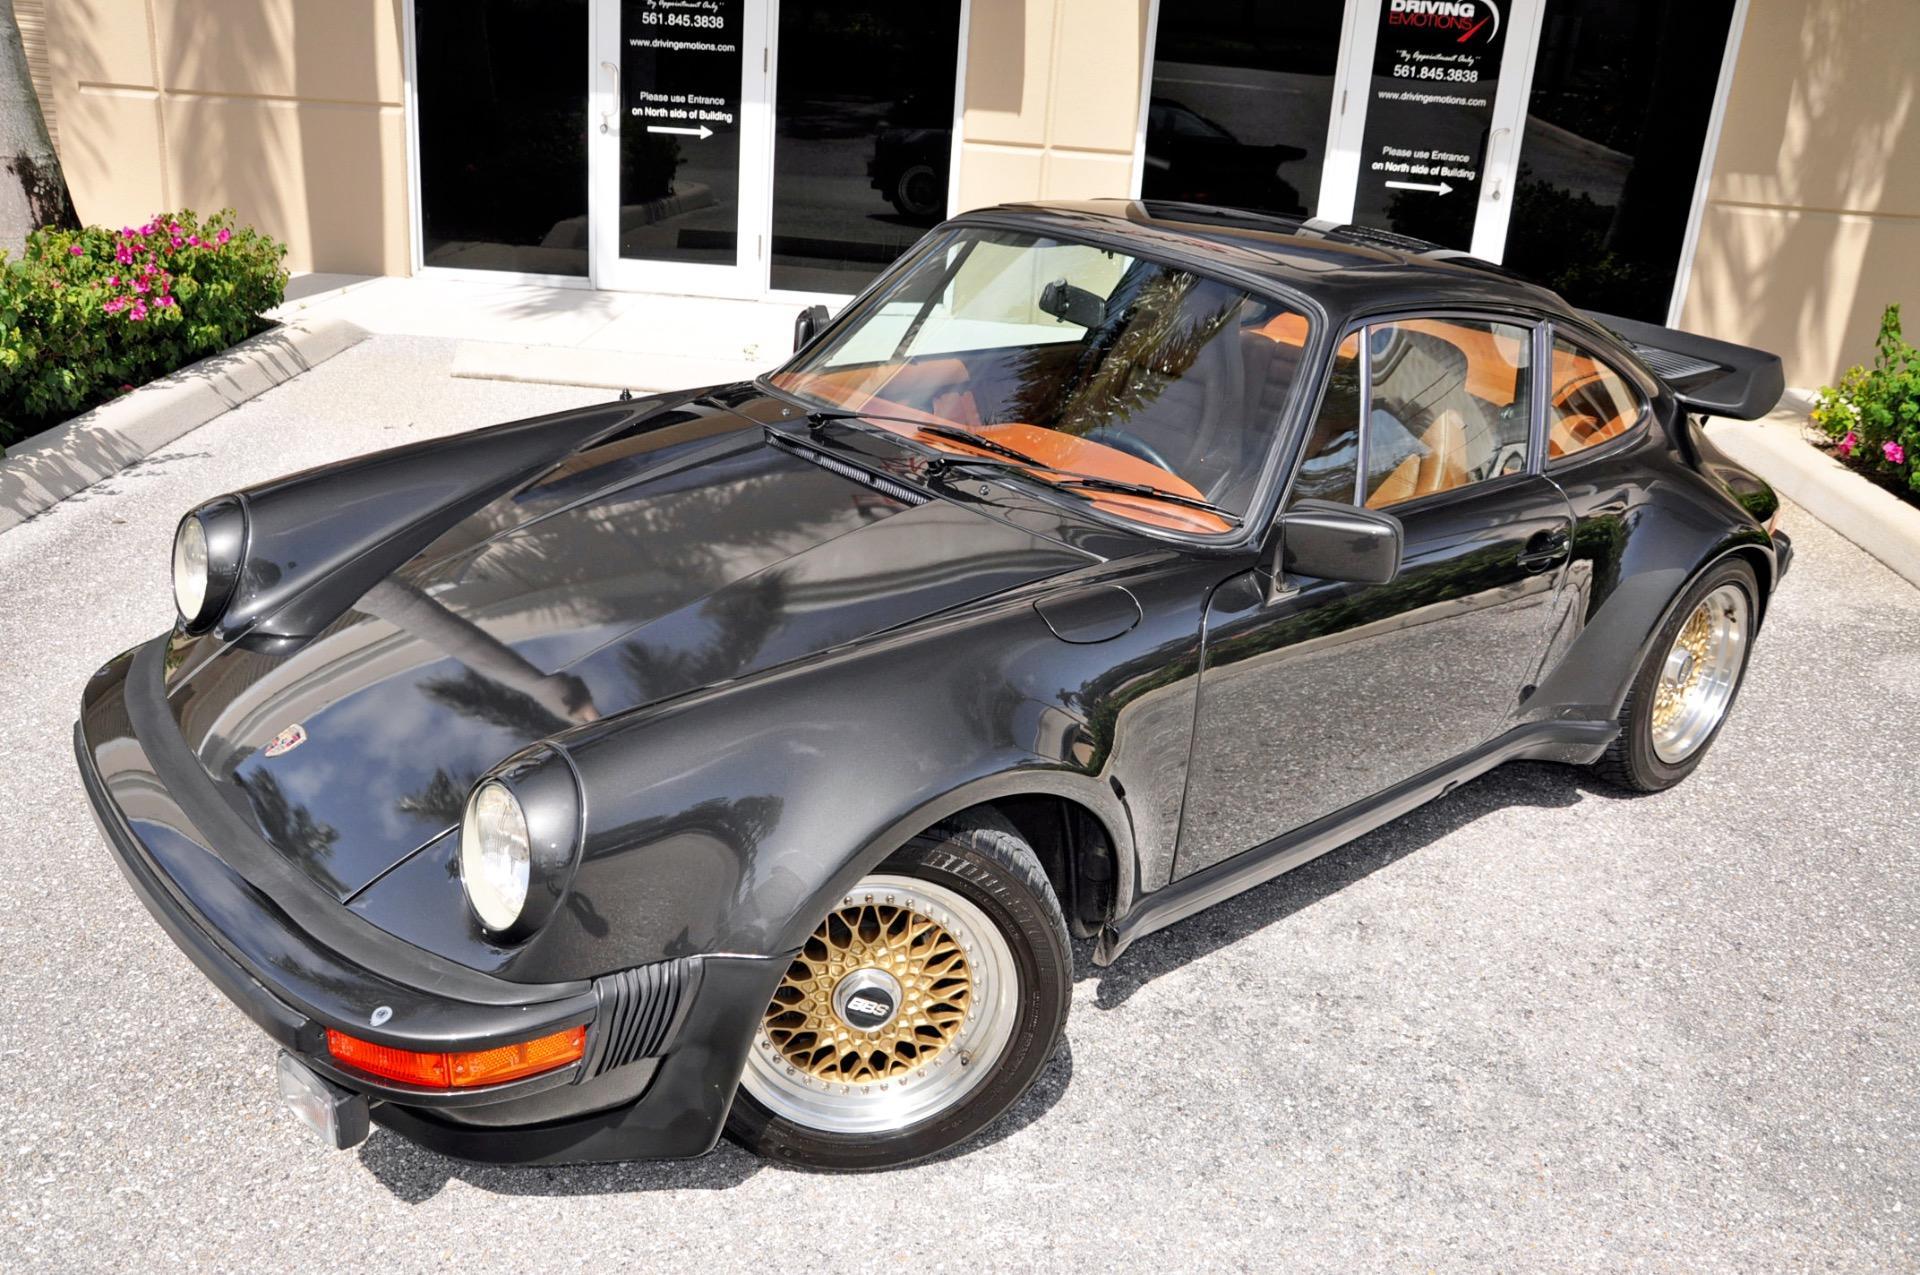 Used 1979 Porsche 911 930 Turbo 930 Turbo | Lake Park, FL